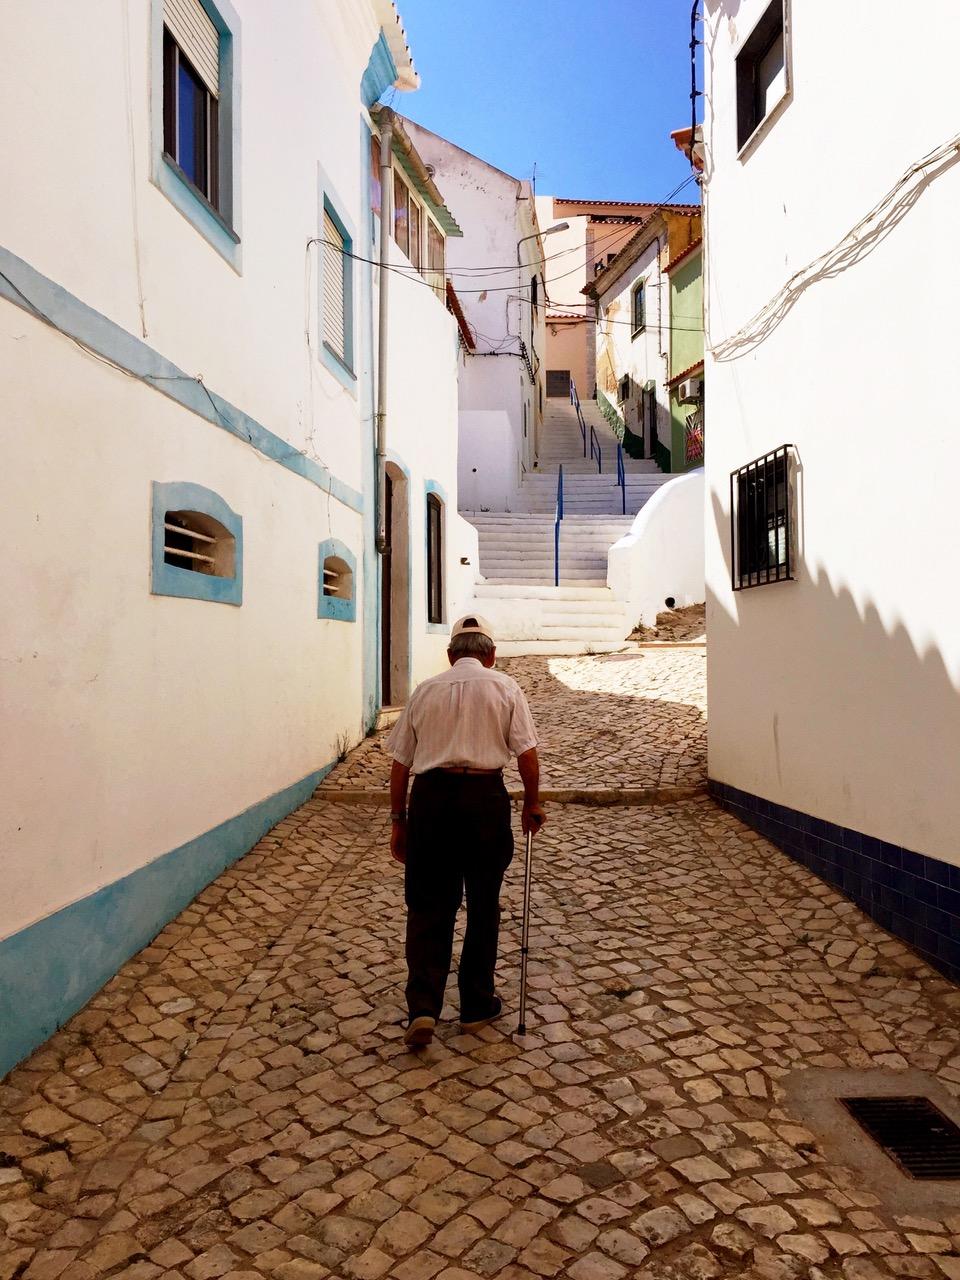 Walking the narrow streets of Ferragudo, Algarve, Portugal